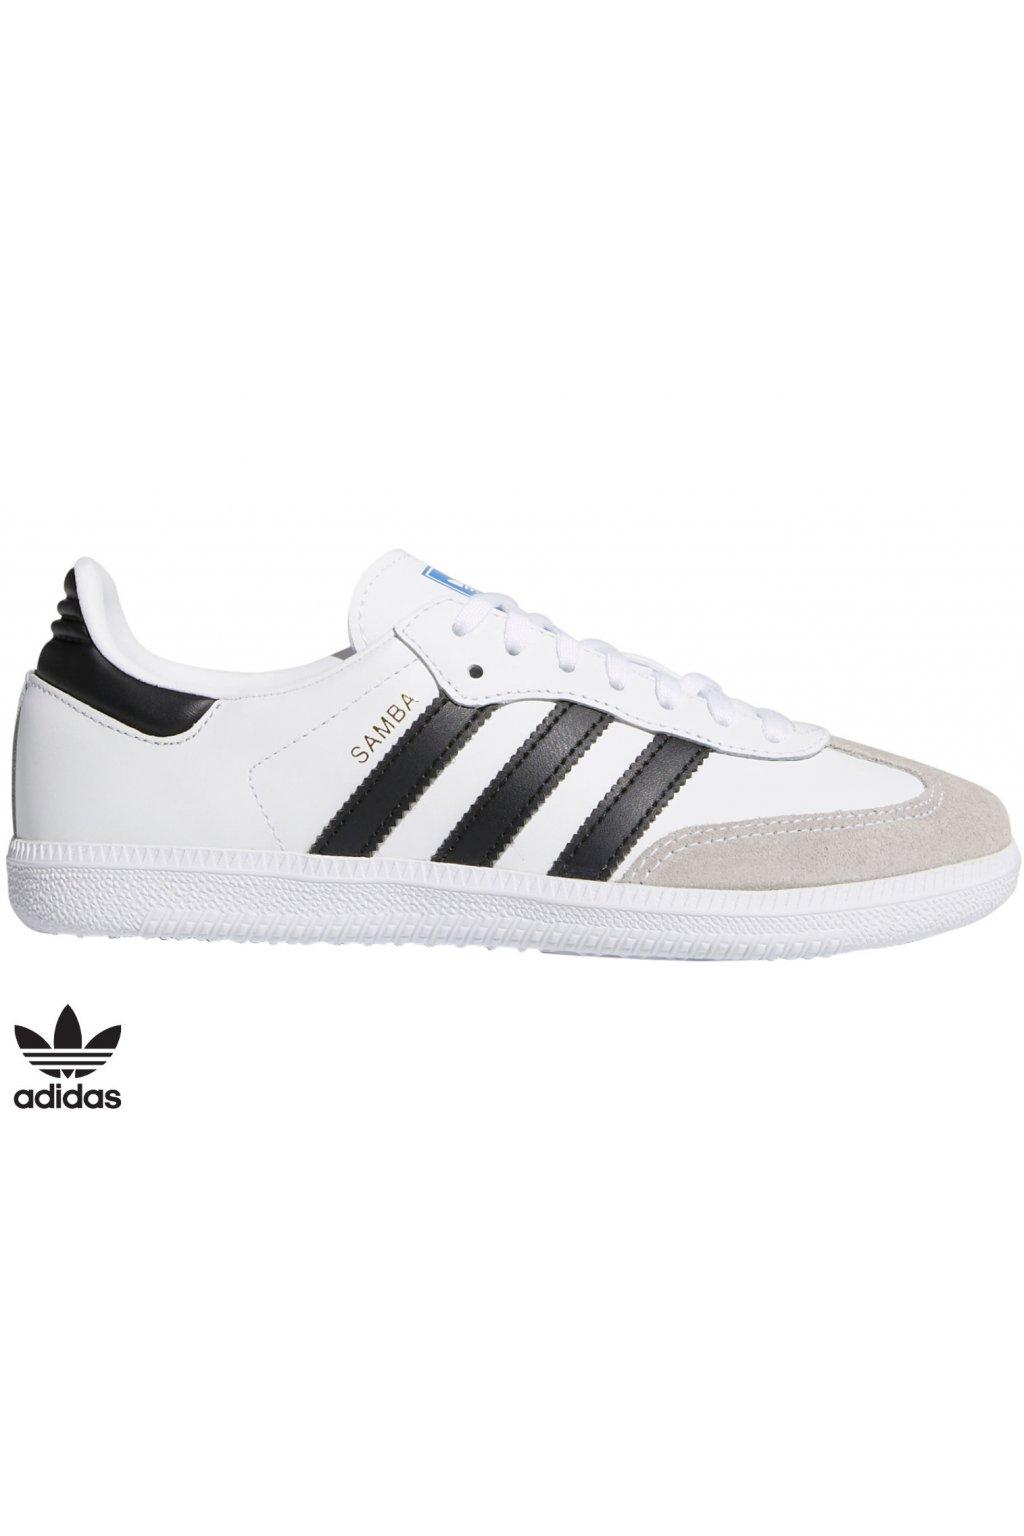 bb6976 juniorske tenisky adidas samba biele